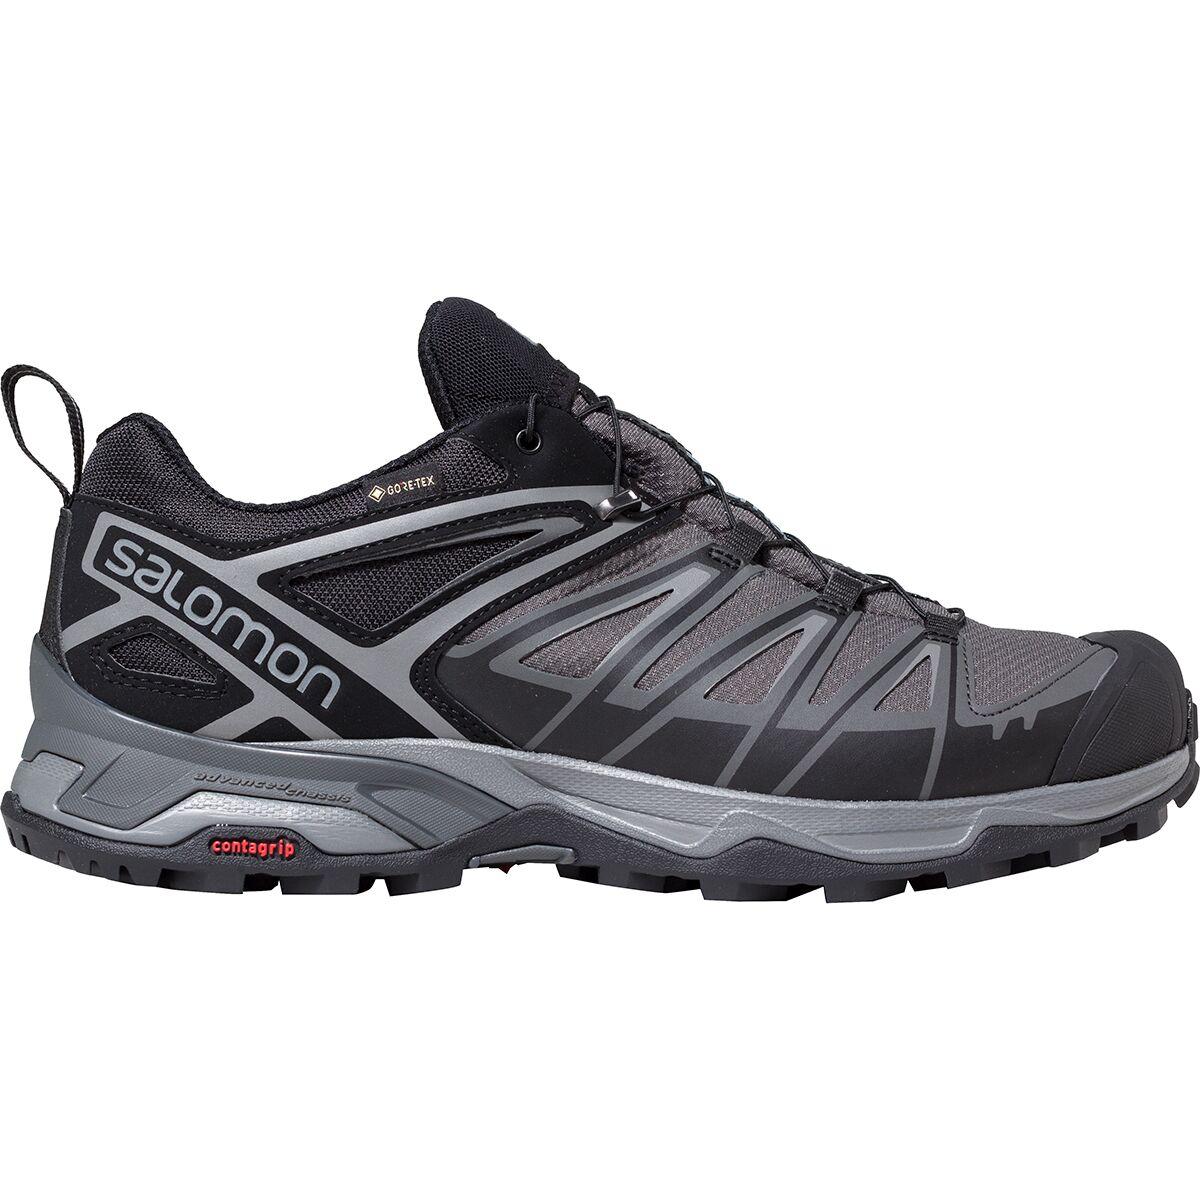 Salomon X Ultra 3 GTX Wide Hiking Shoe